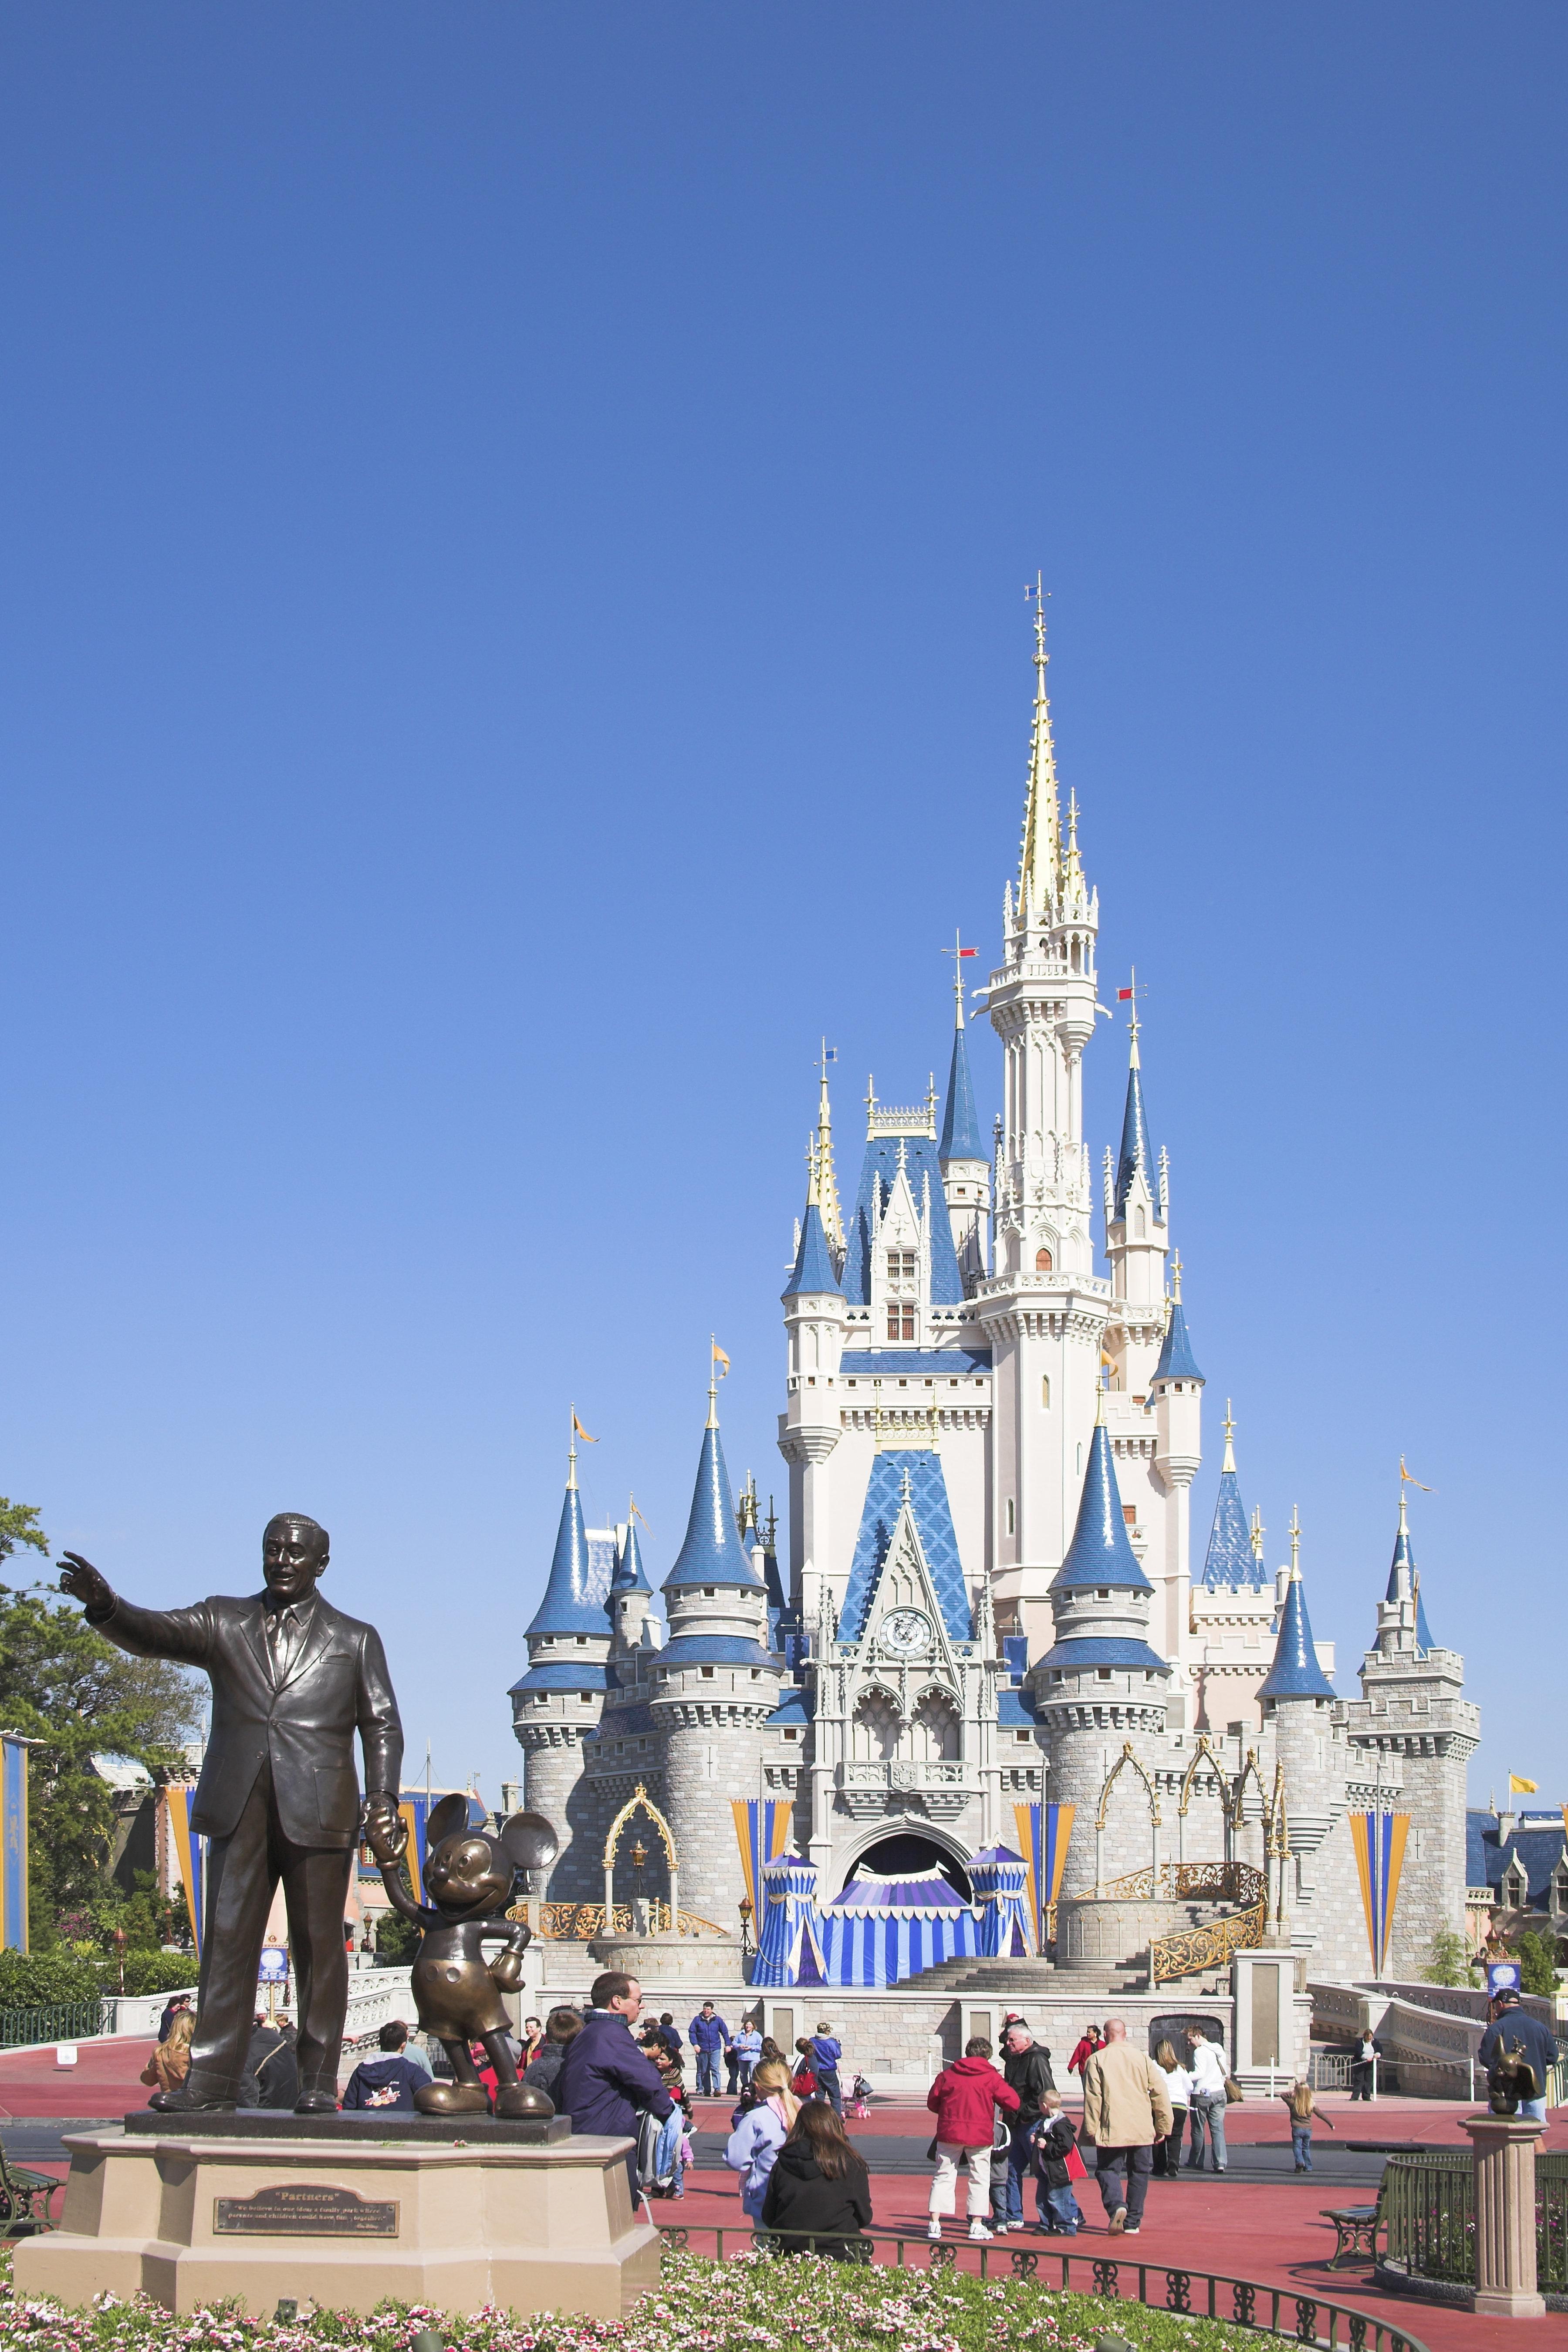 Walt Disney and Mickey Mouse Partners statue and Cinderella Castle, Magic Kingdom, Orlando, Florida, USA